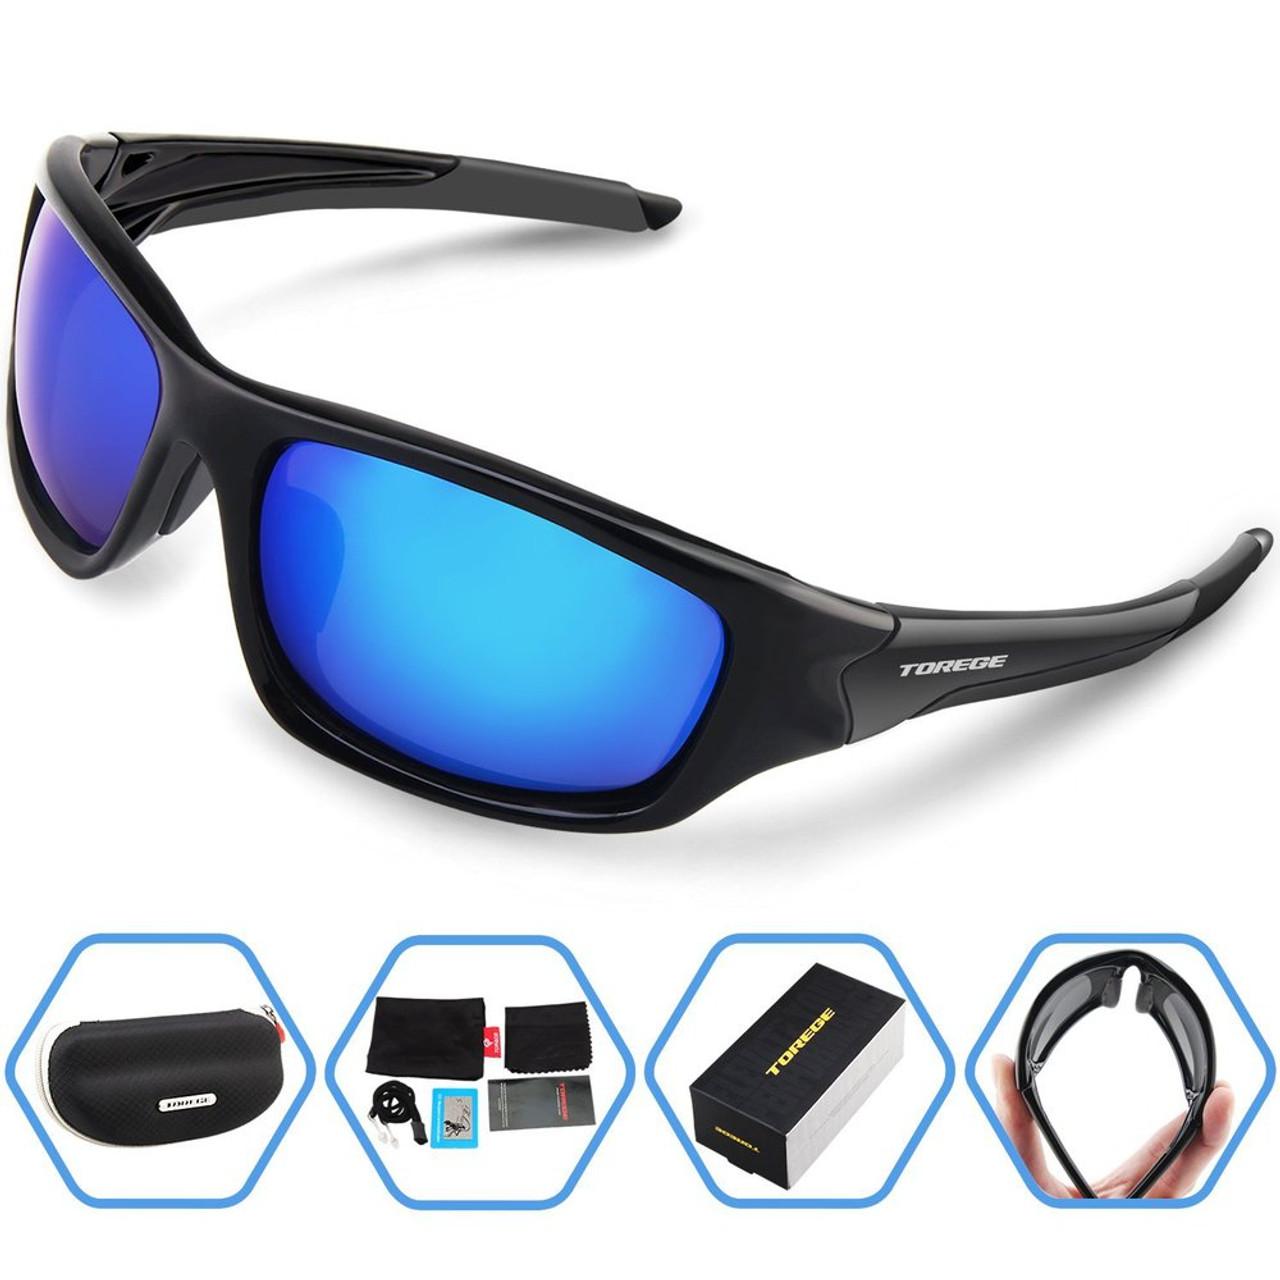 0087aab429 TOREGE Men s Fashion Polarized Sunglasses For Driving Glasses TR90  Unbreakable Frame Eyewear Unisex 100% UV400 ...